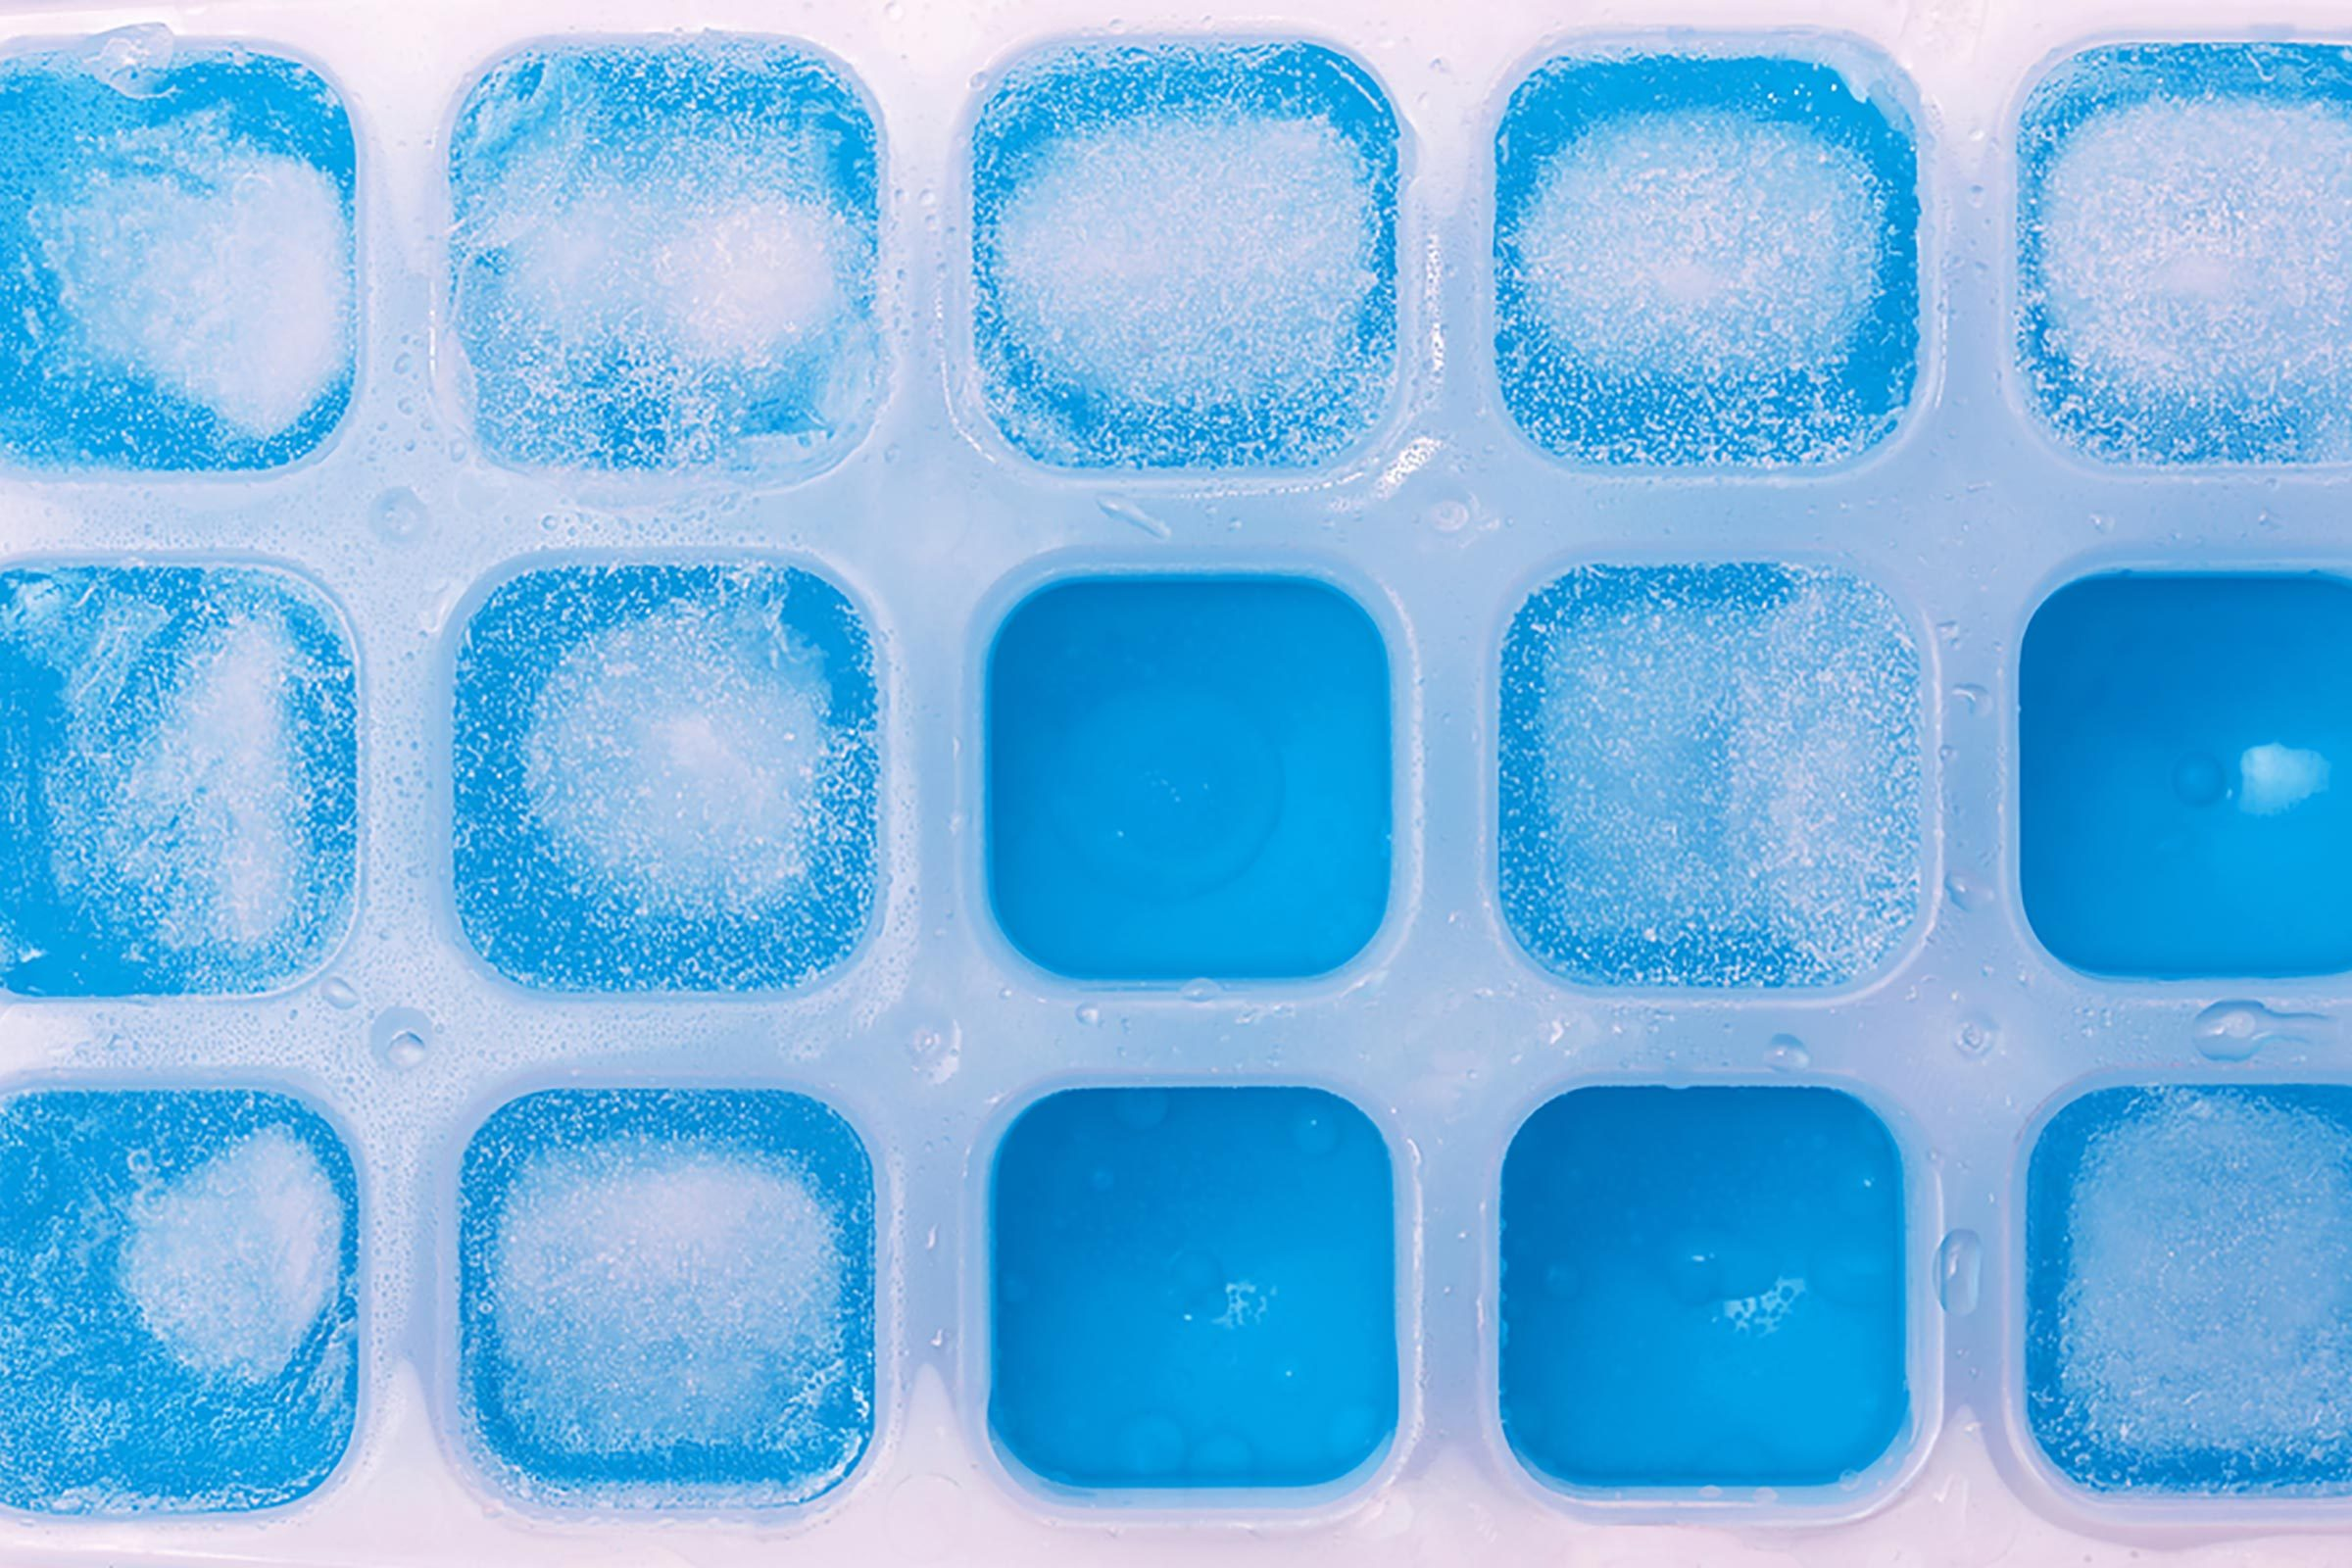 White vinegar uses ice trays